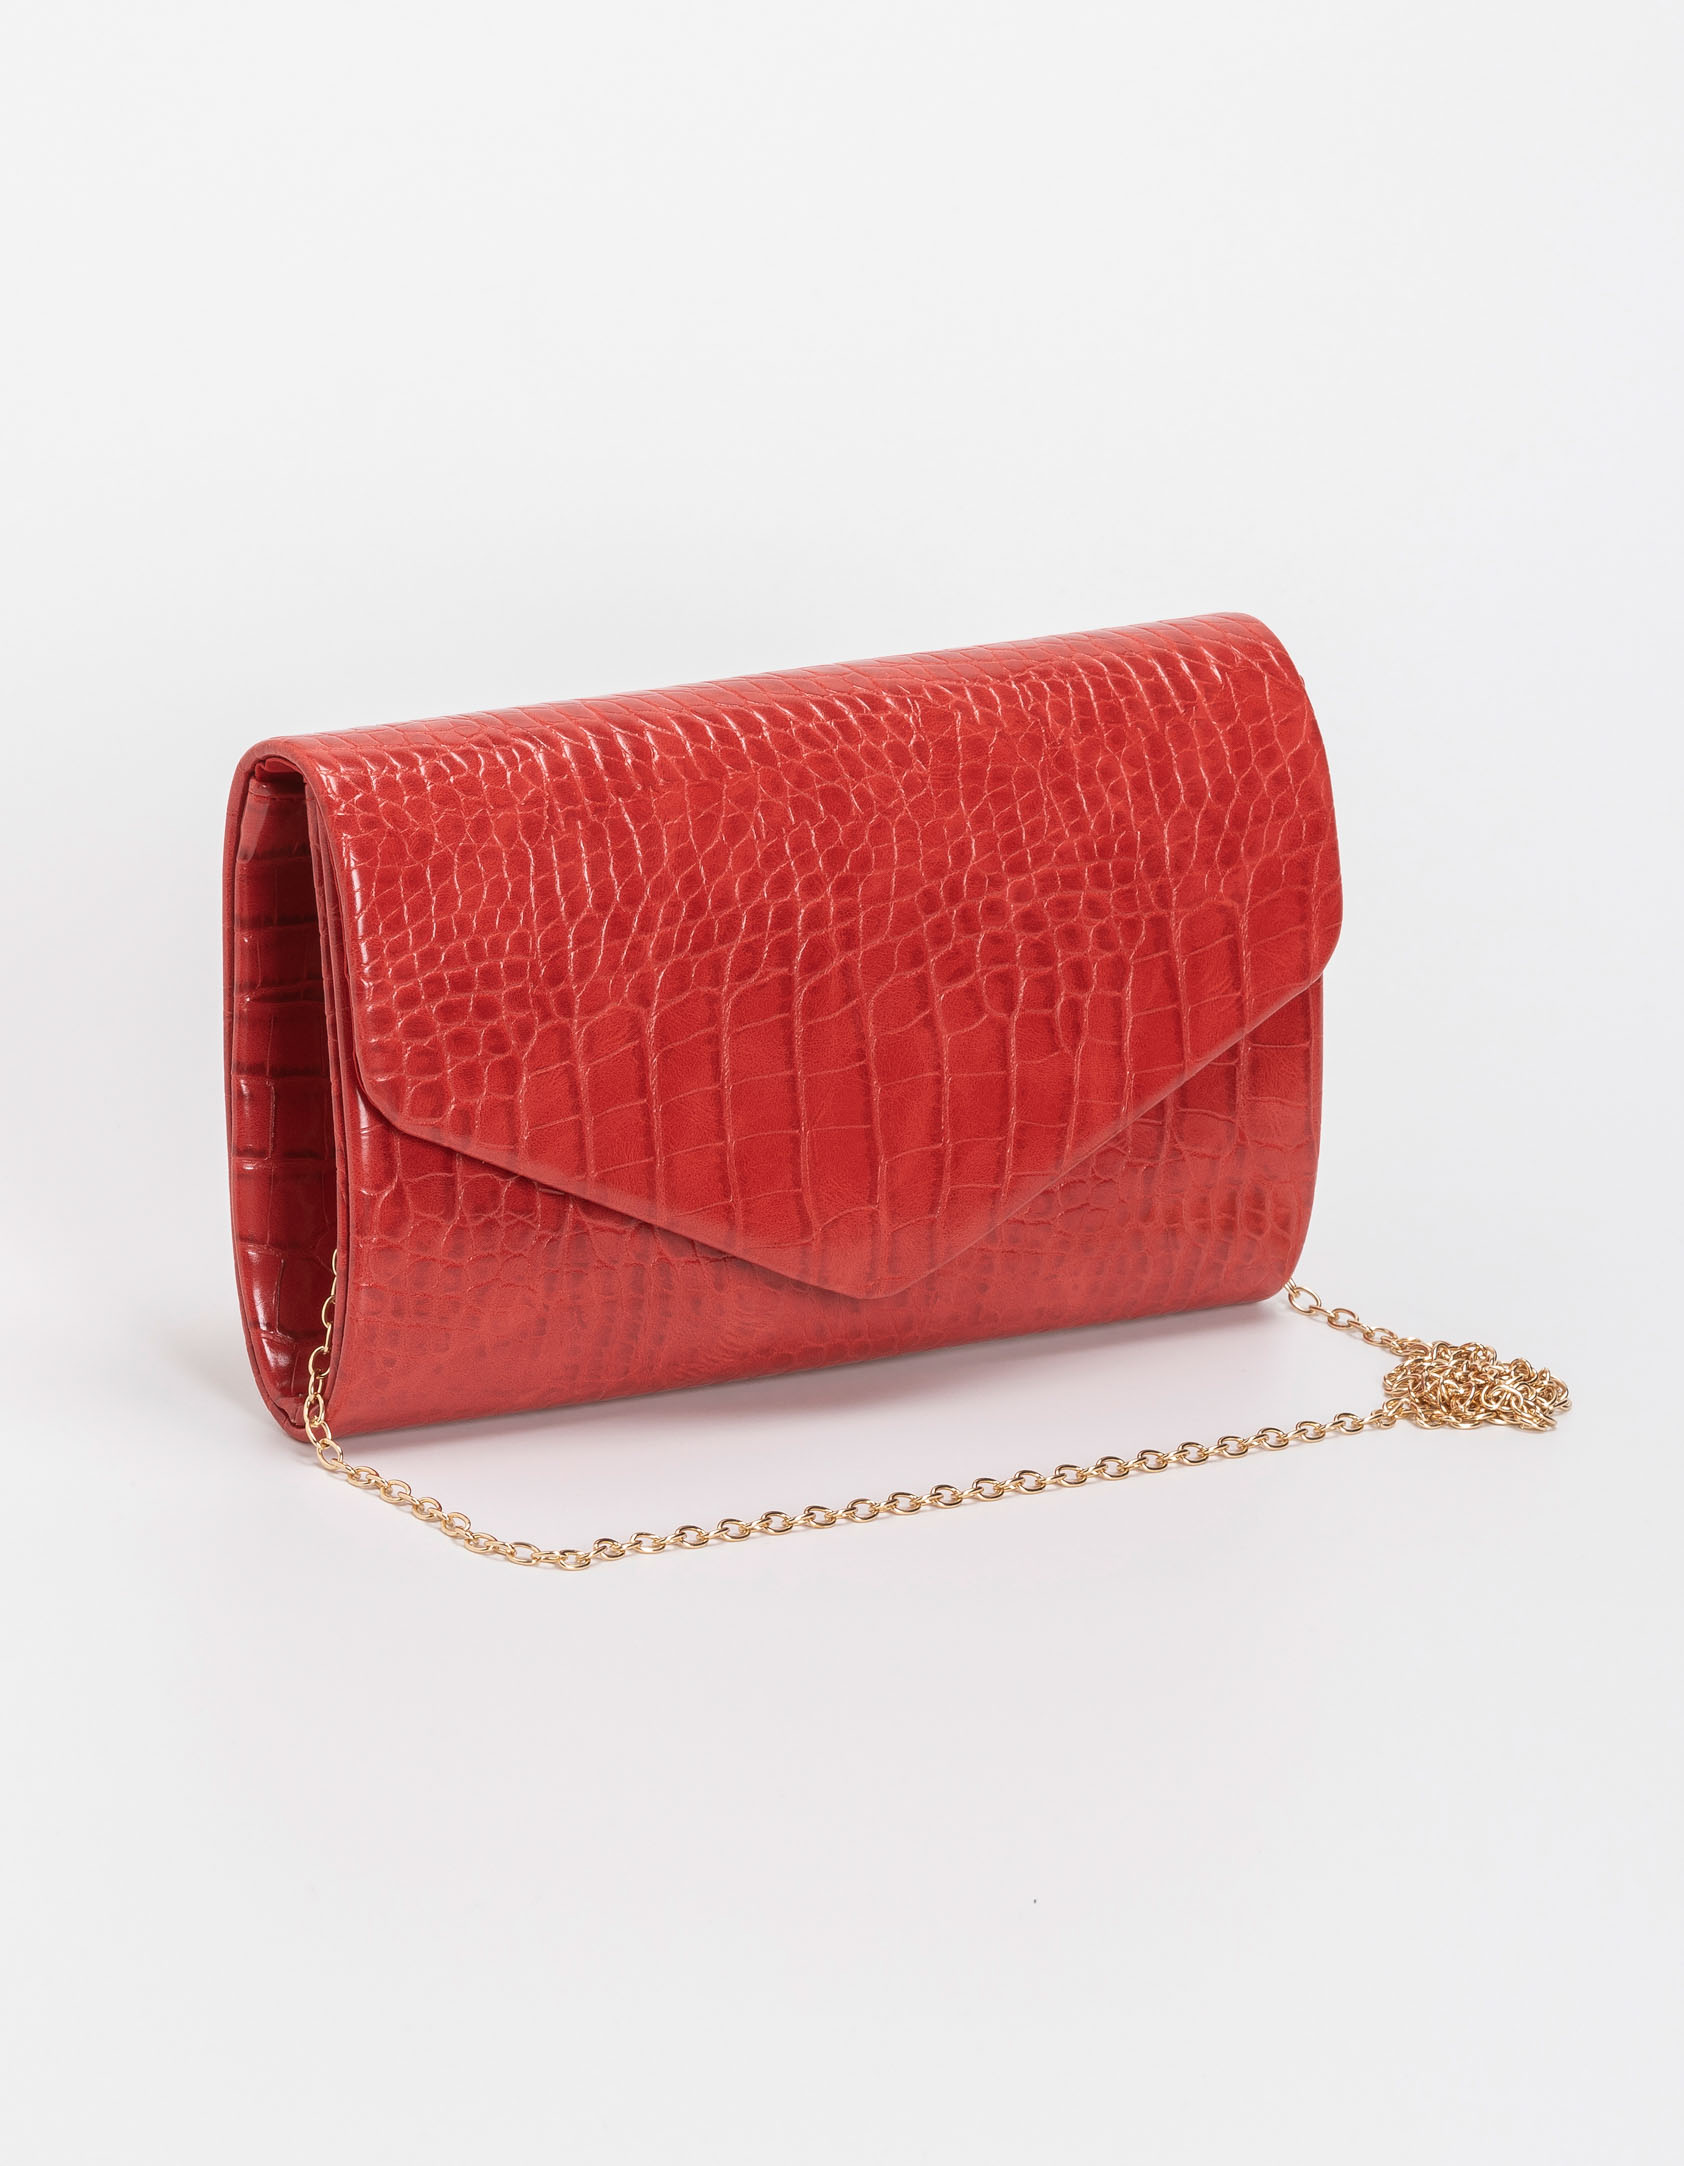 Croco τσάντα φάκελος - Κόκκινο